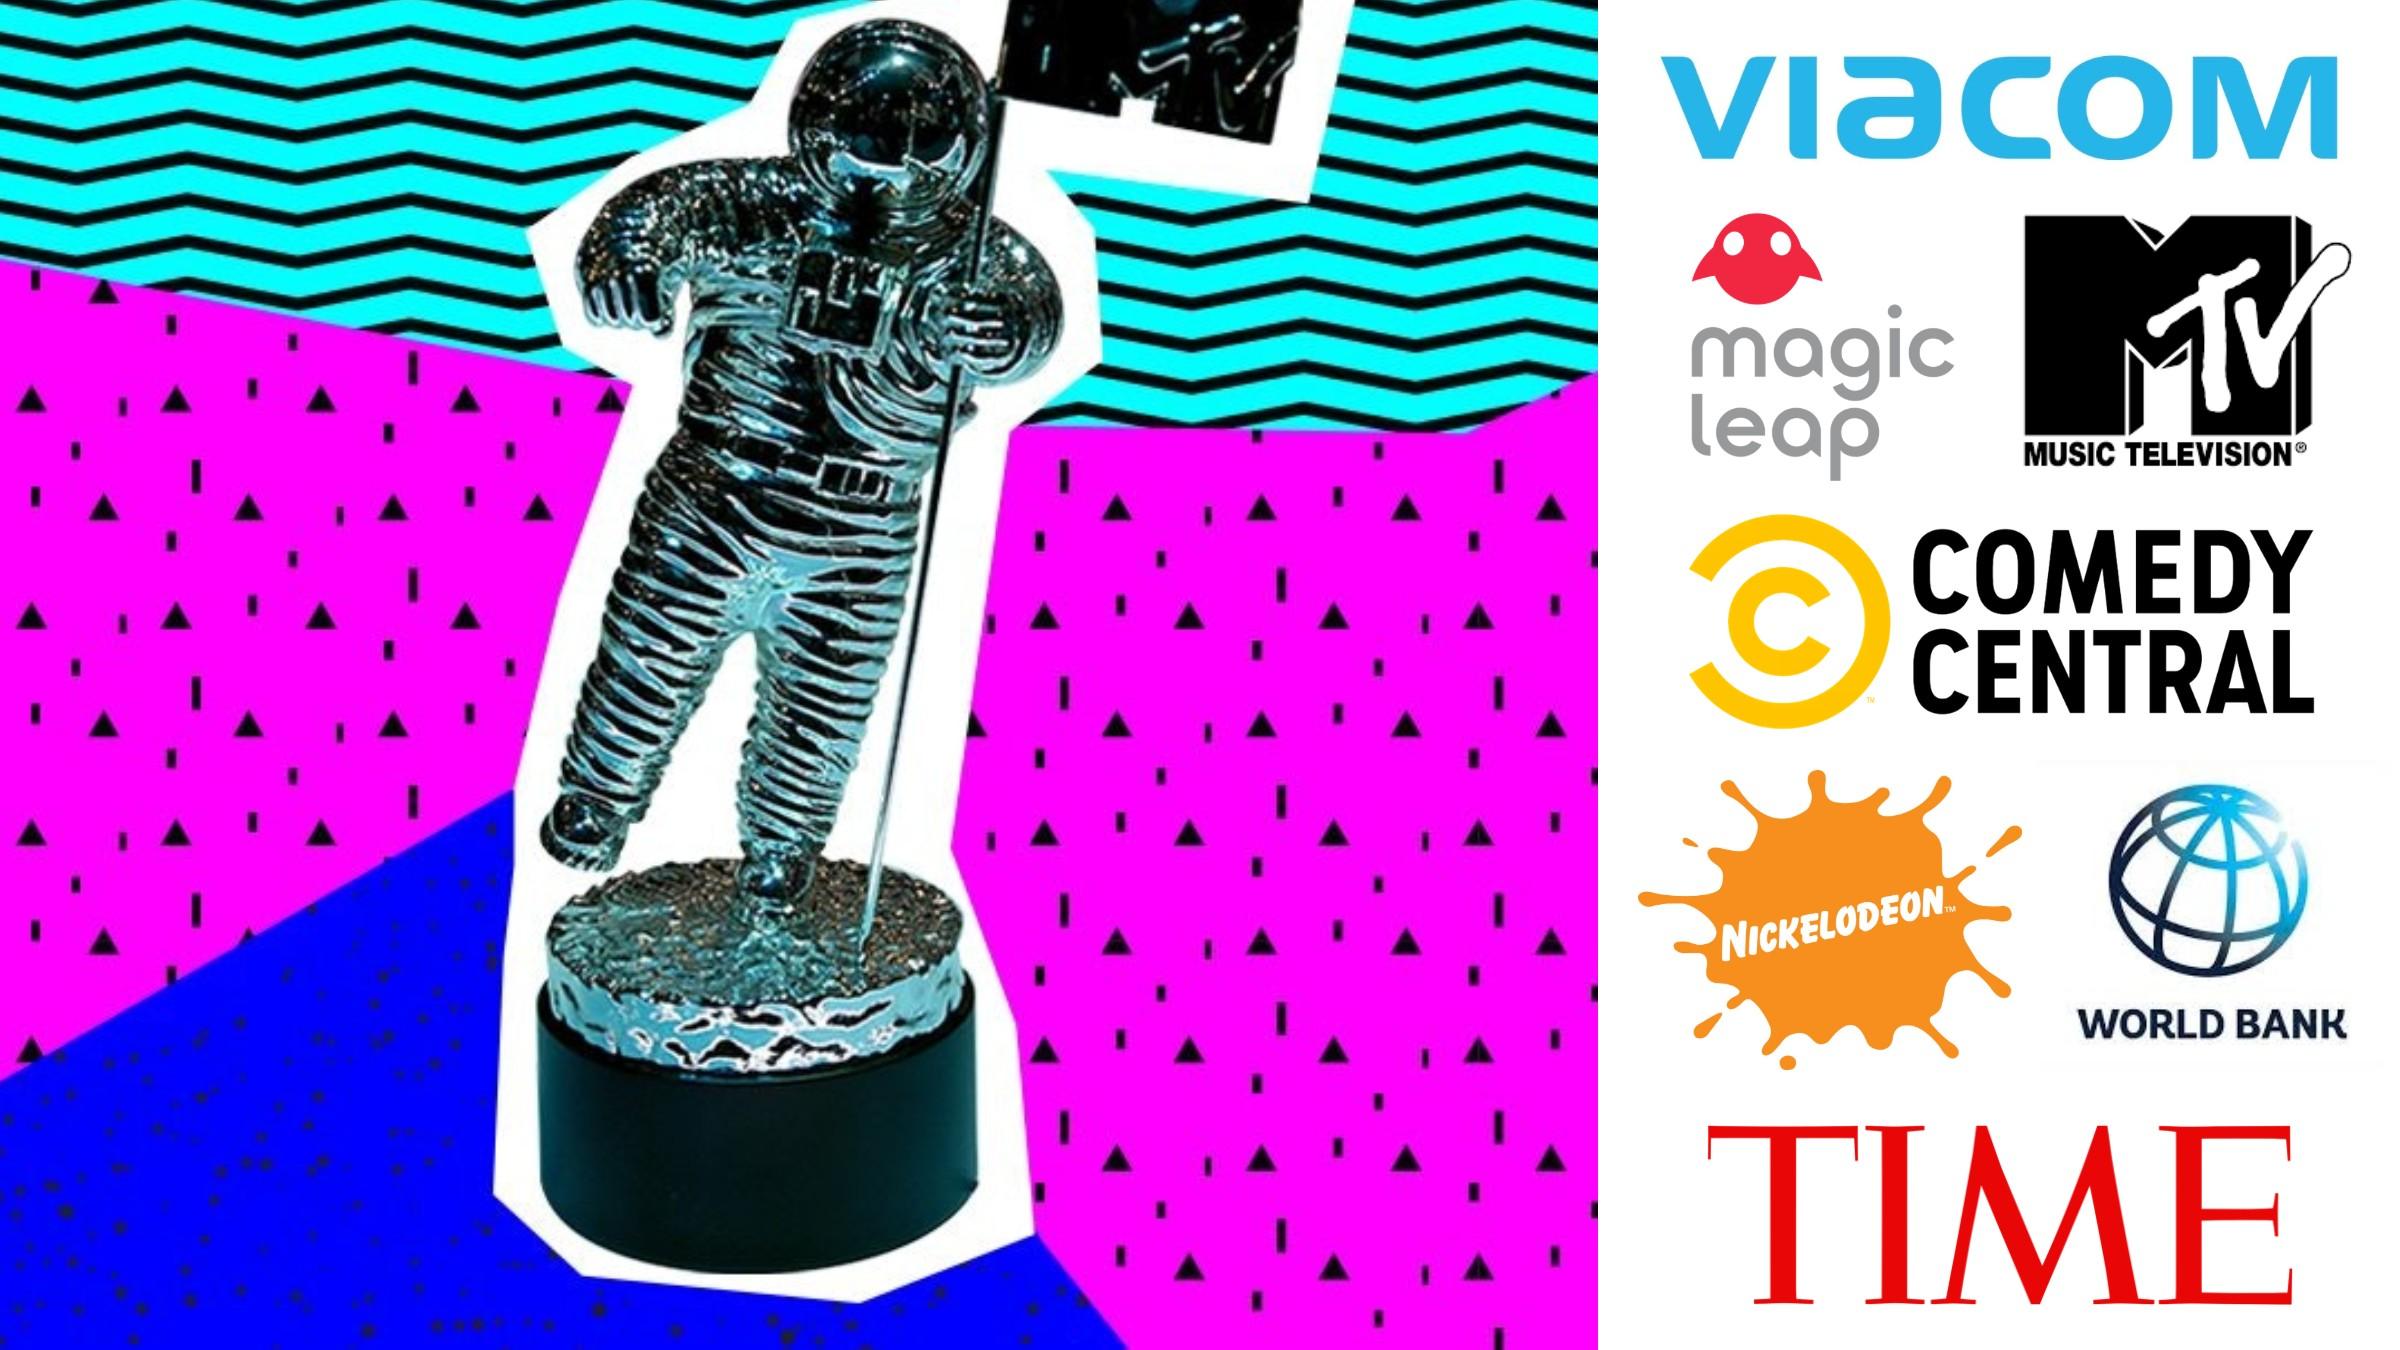 VRAR-Association-VRAR-Global-Summit-VRARGS-Magic-Leap-World-Bank-Niantic-labs-Viacom-Advanced-Advertising-Innovation-Comedy-Central-VRARAGS.jpg